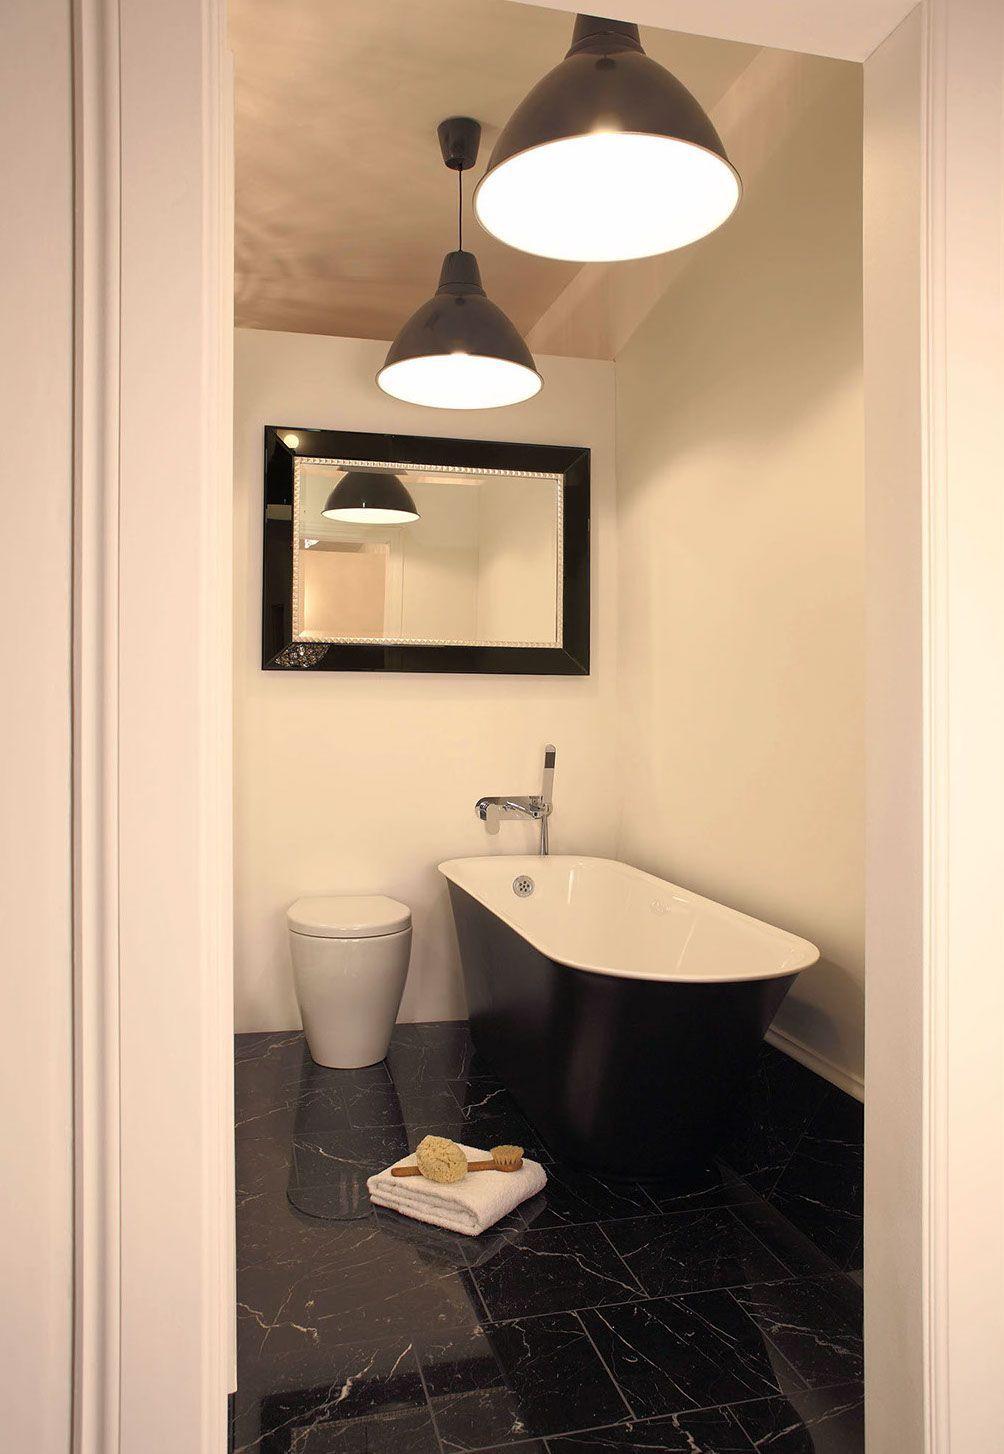 visit albion s luxury bathroom showroom luxurybathroomshowrooms rh ar pinterest com